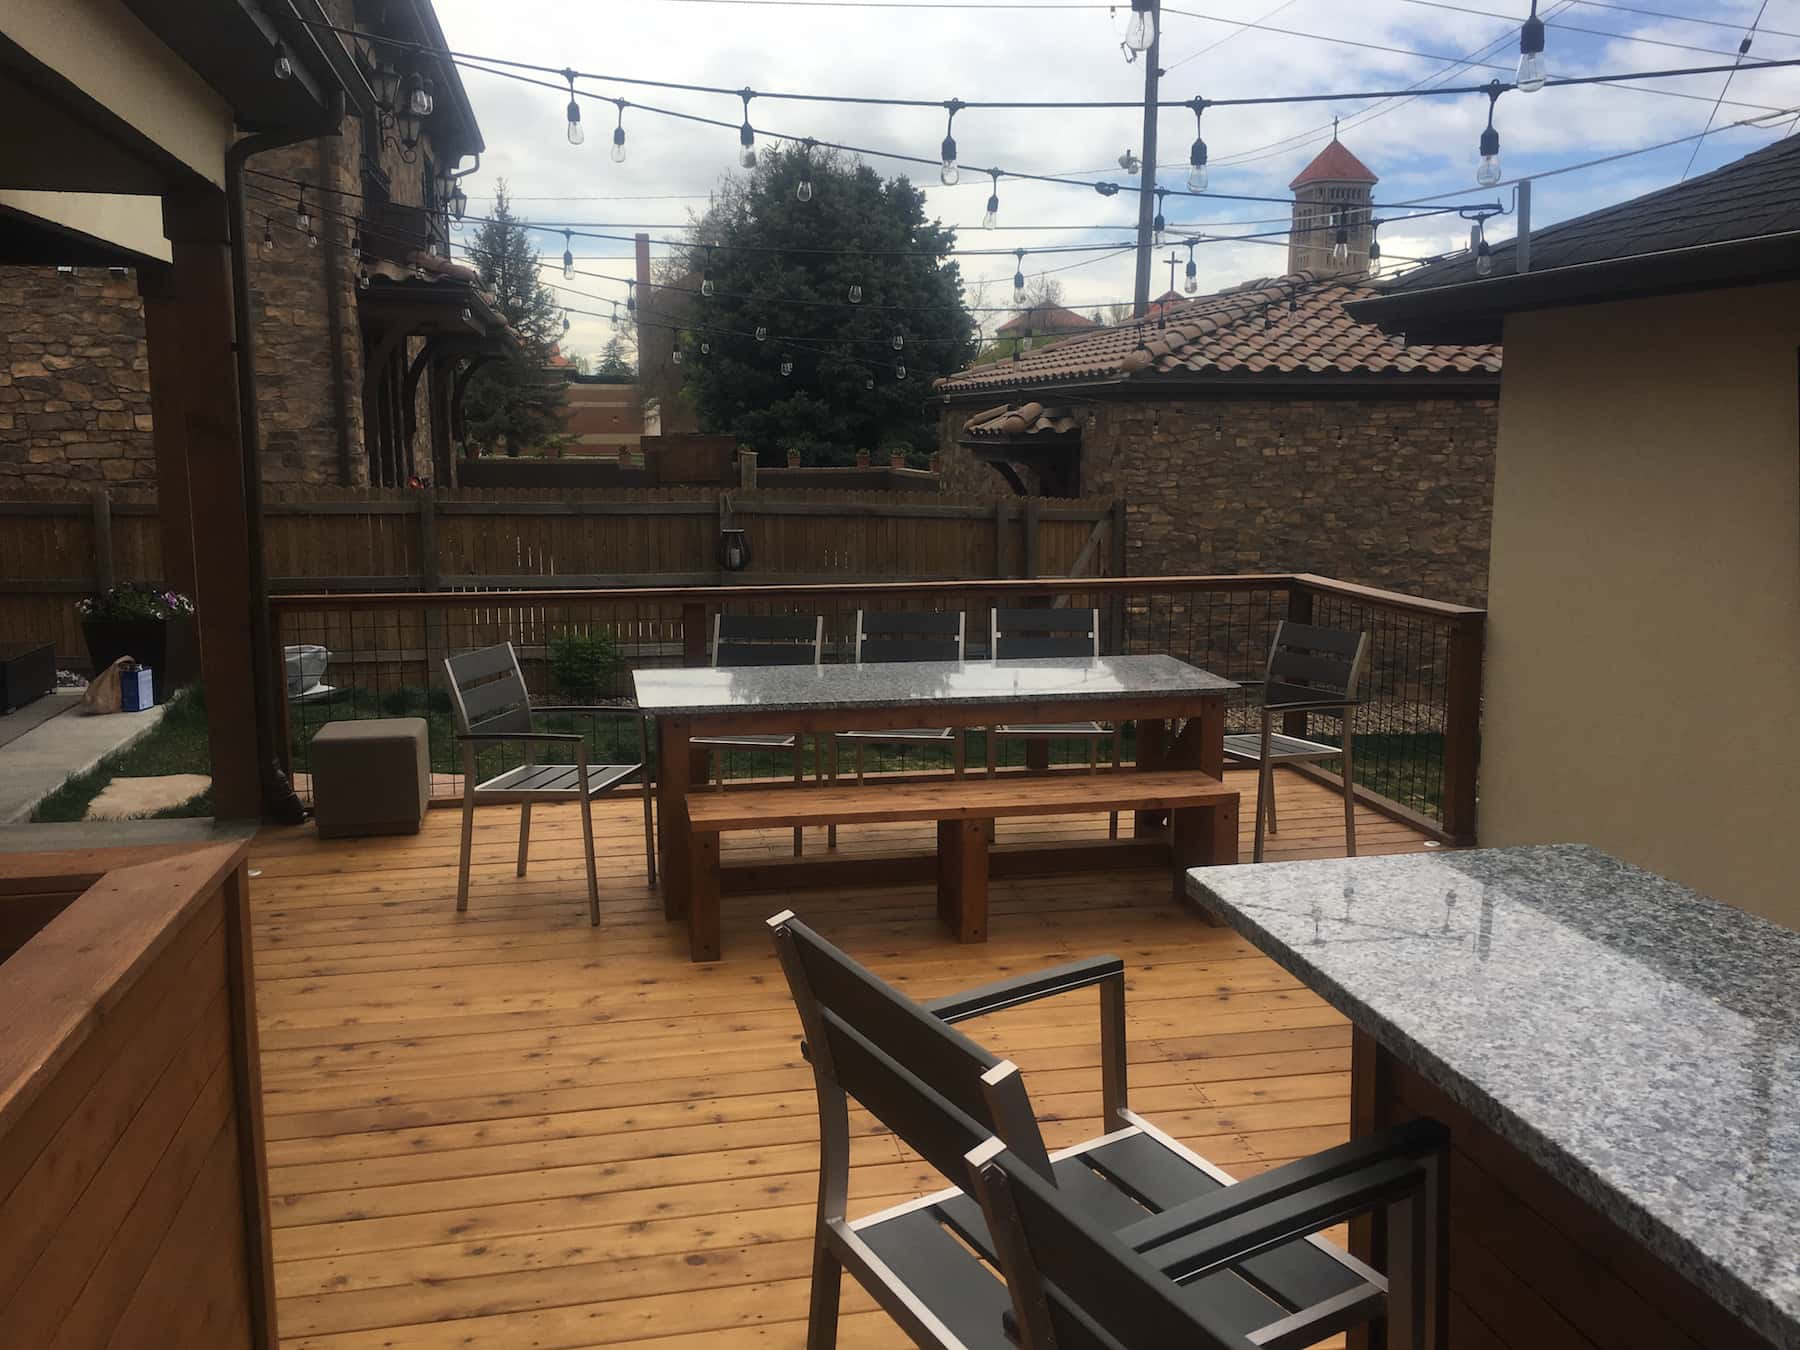 outdoor kitchen deck railing lights outdoor dining cherry creek denver co